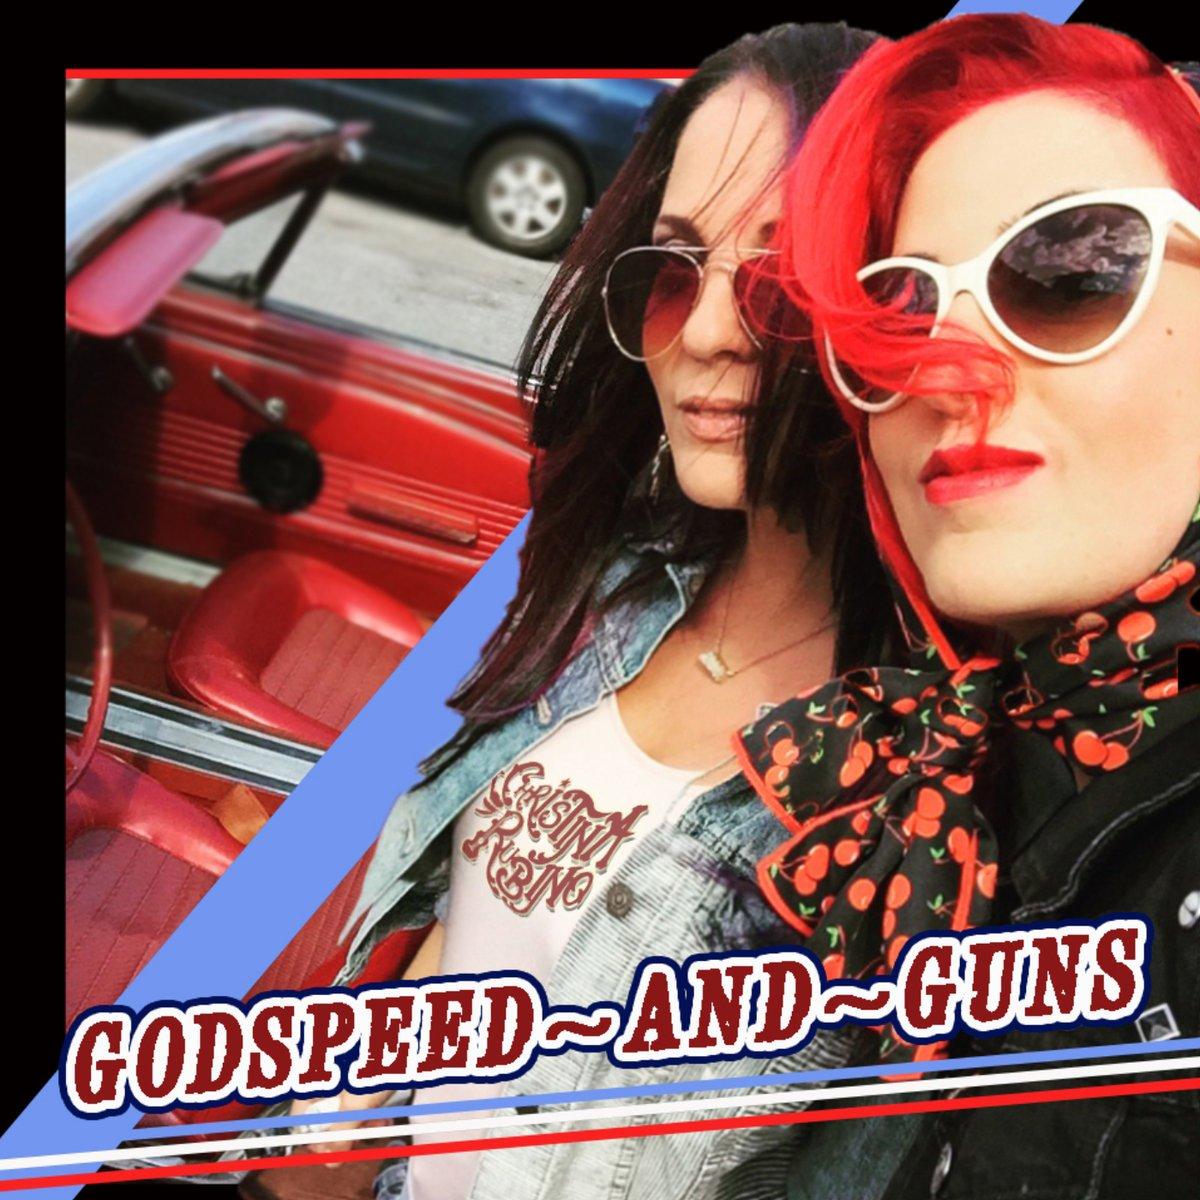 Godspeed and guns